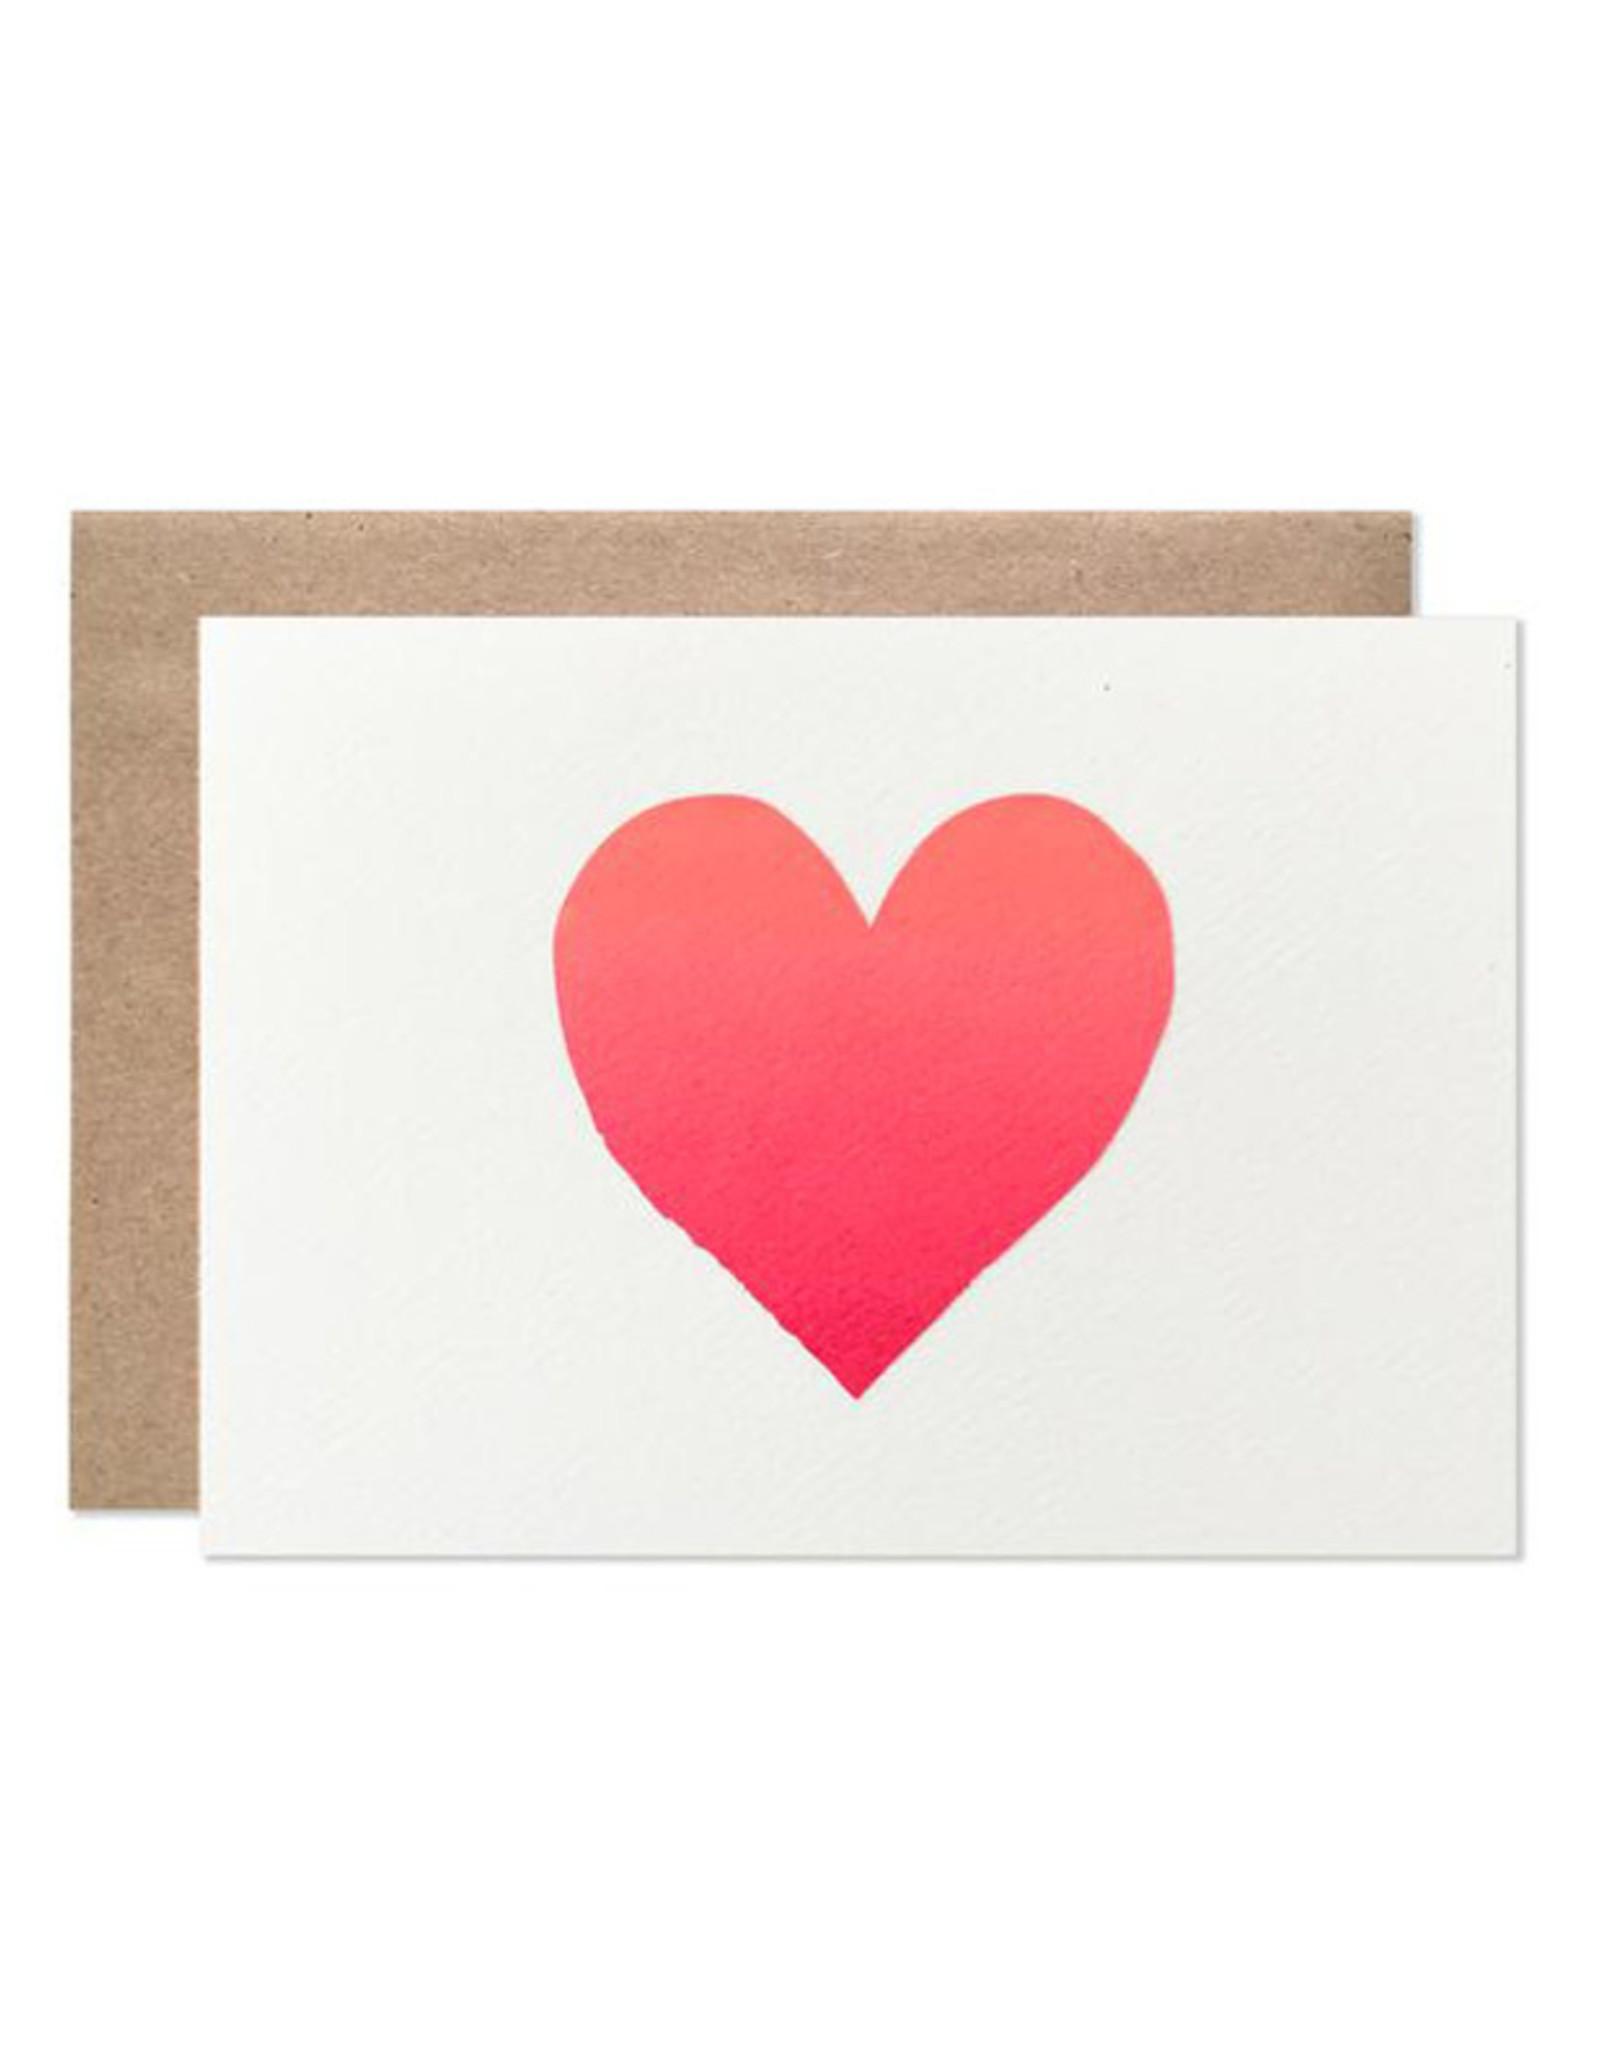 Hartland Brooklyn Boxed Cards - Ombre Heart (8)